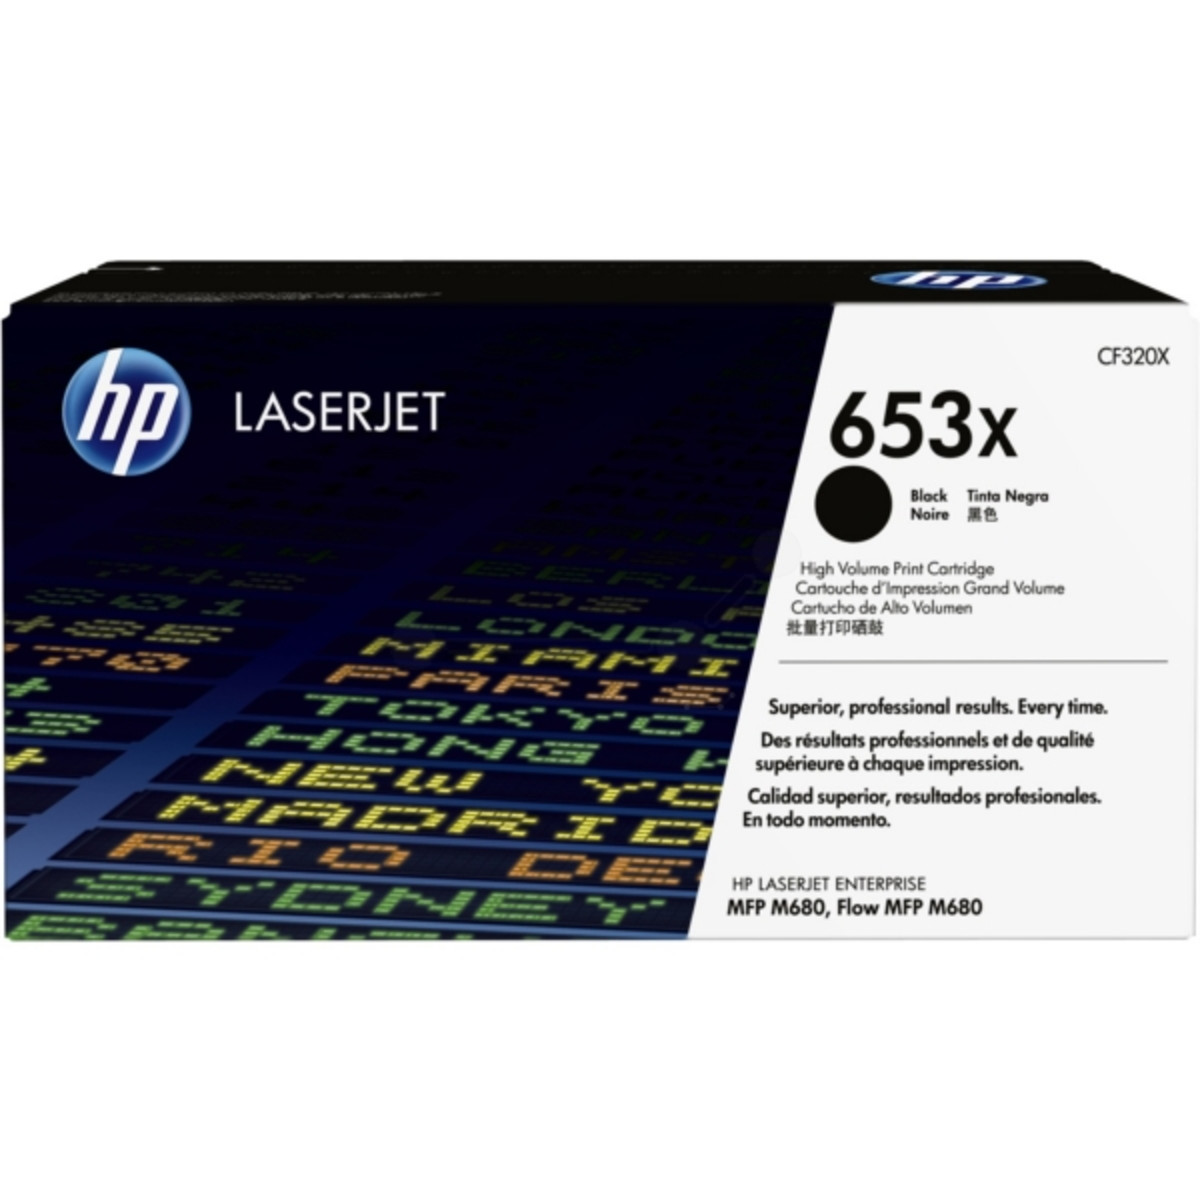 HP 653X (CF320X) Black Toner Cartridge - High Yield